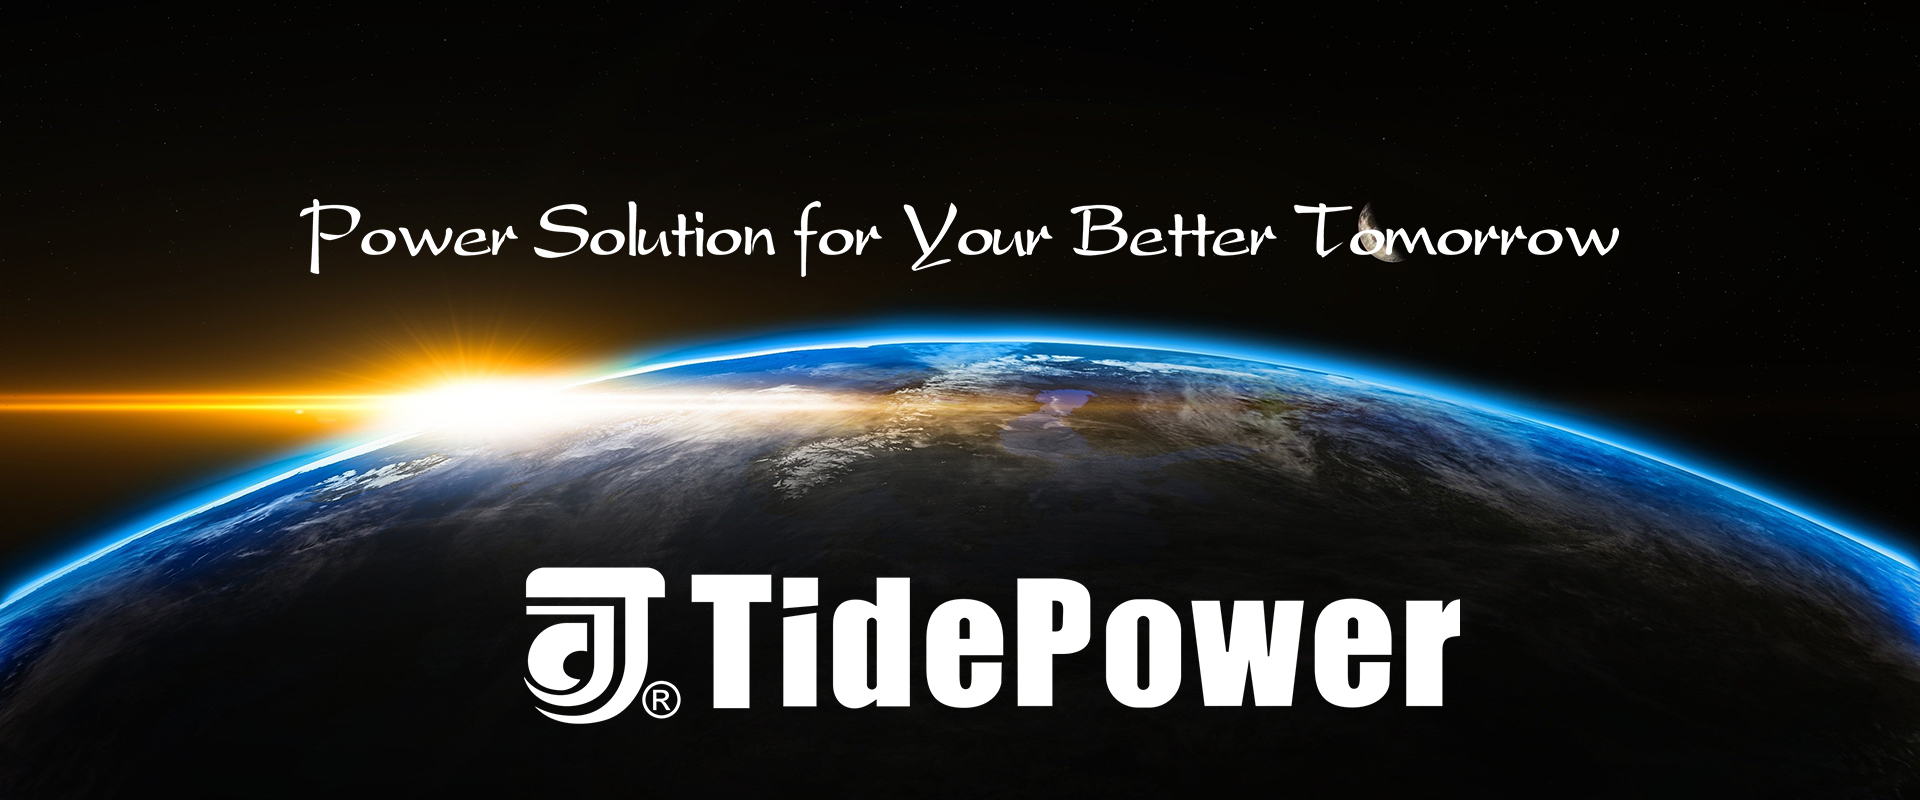 tidepower;diesel generator;gas generator